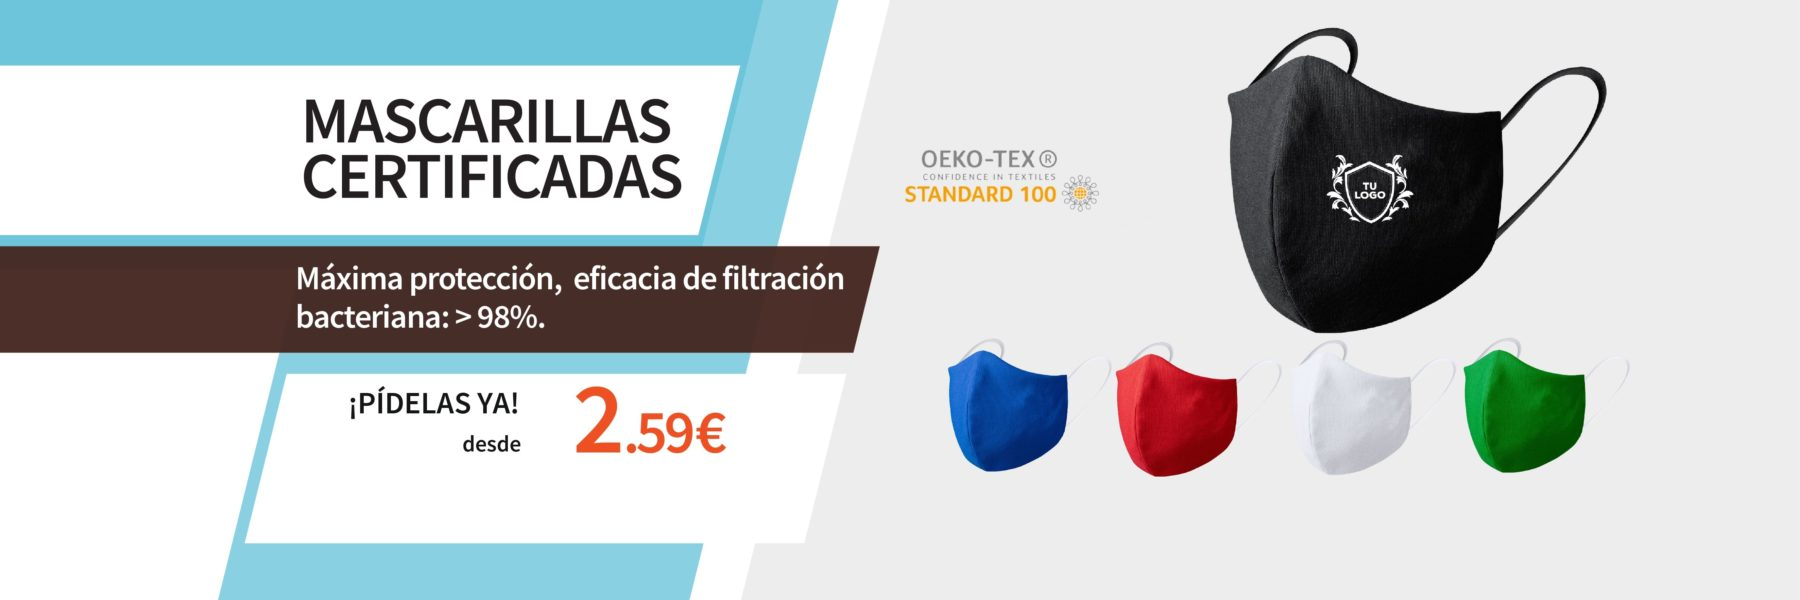 Mascarillas Certificadas Garment Printing